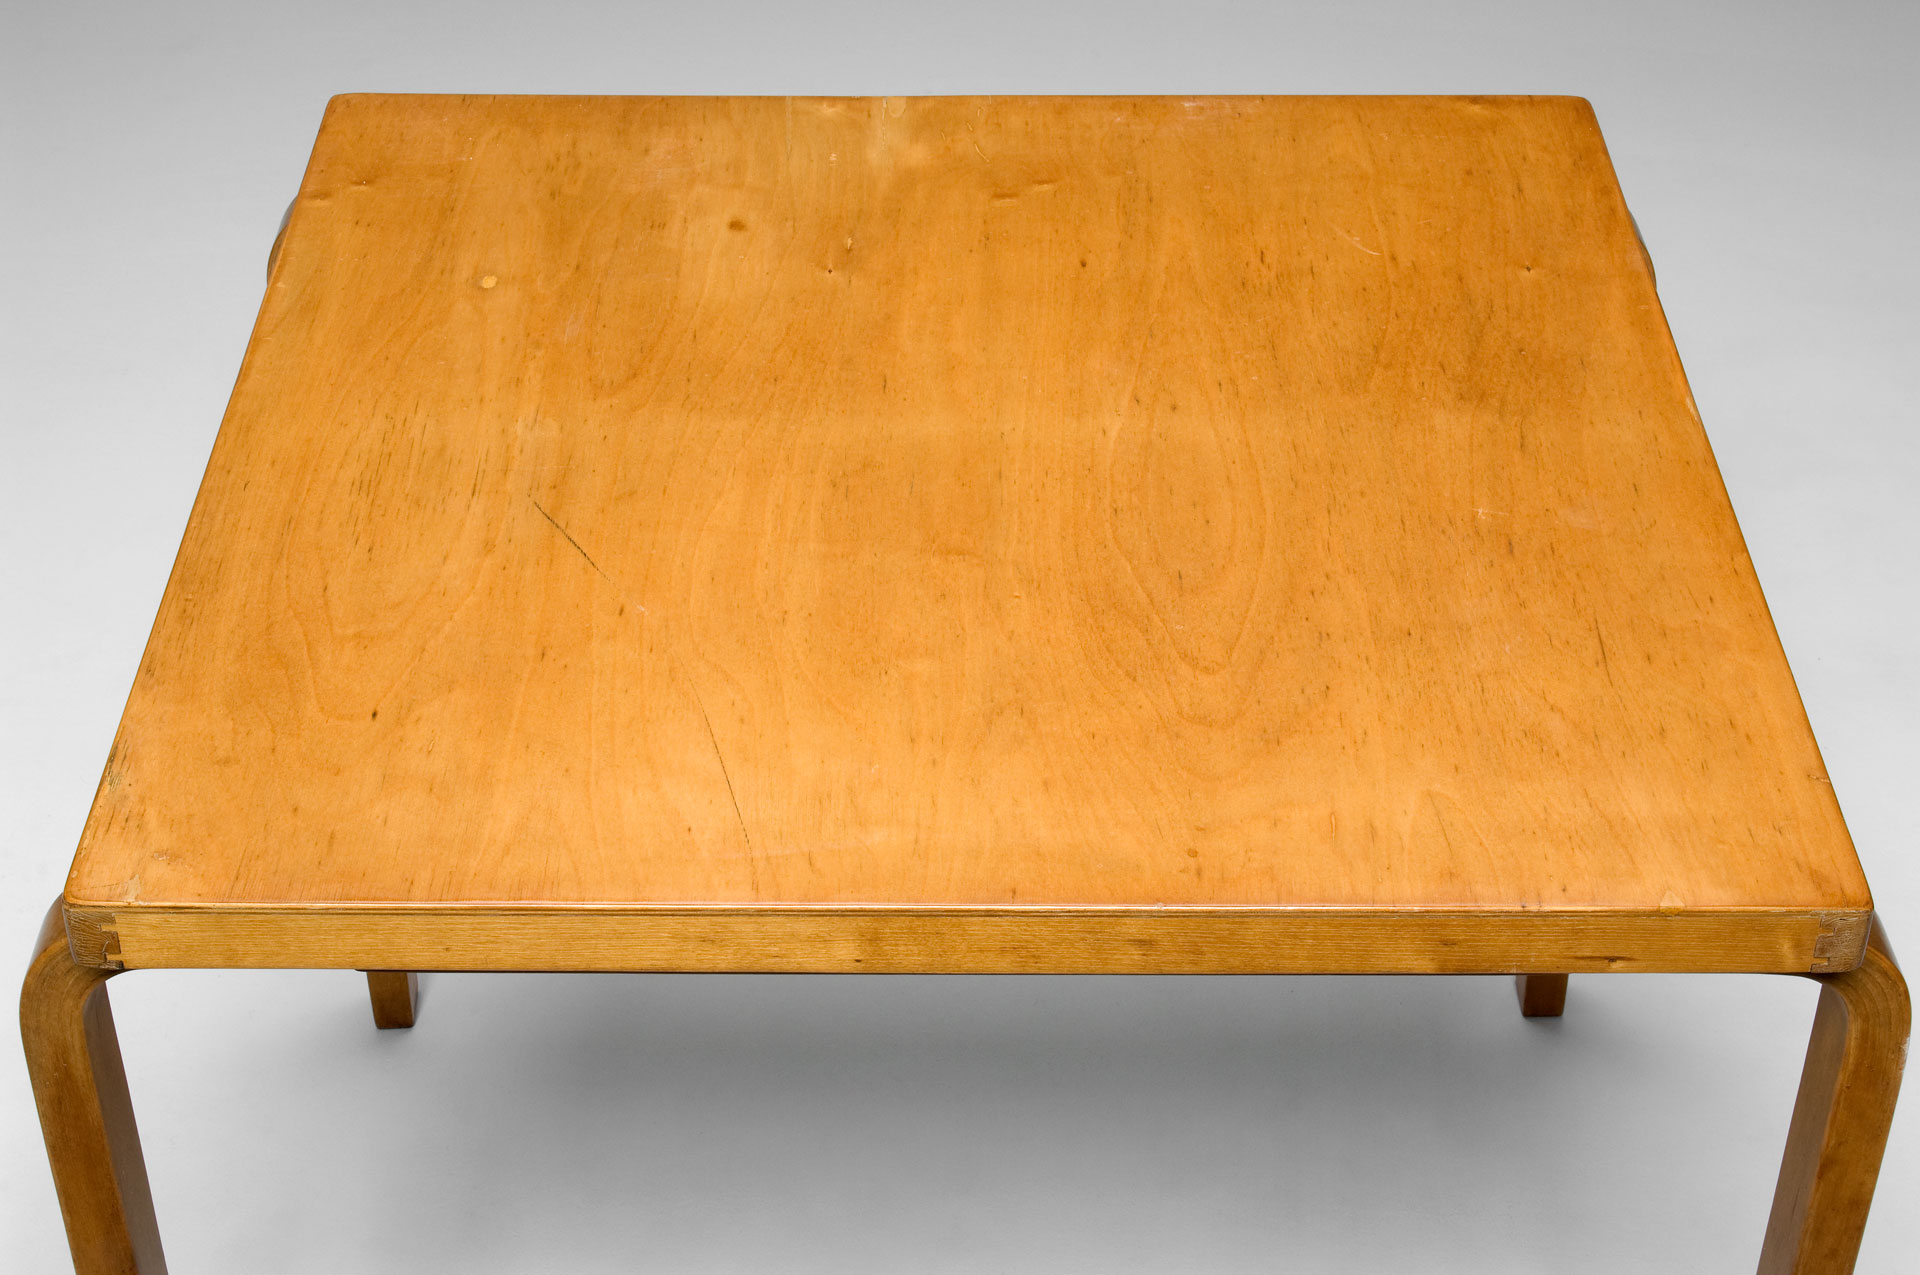 Jacksons Alvar Aalto Table No 70 Alvar Aalto